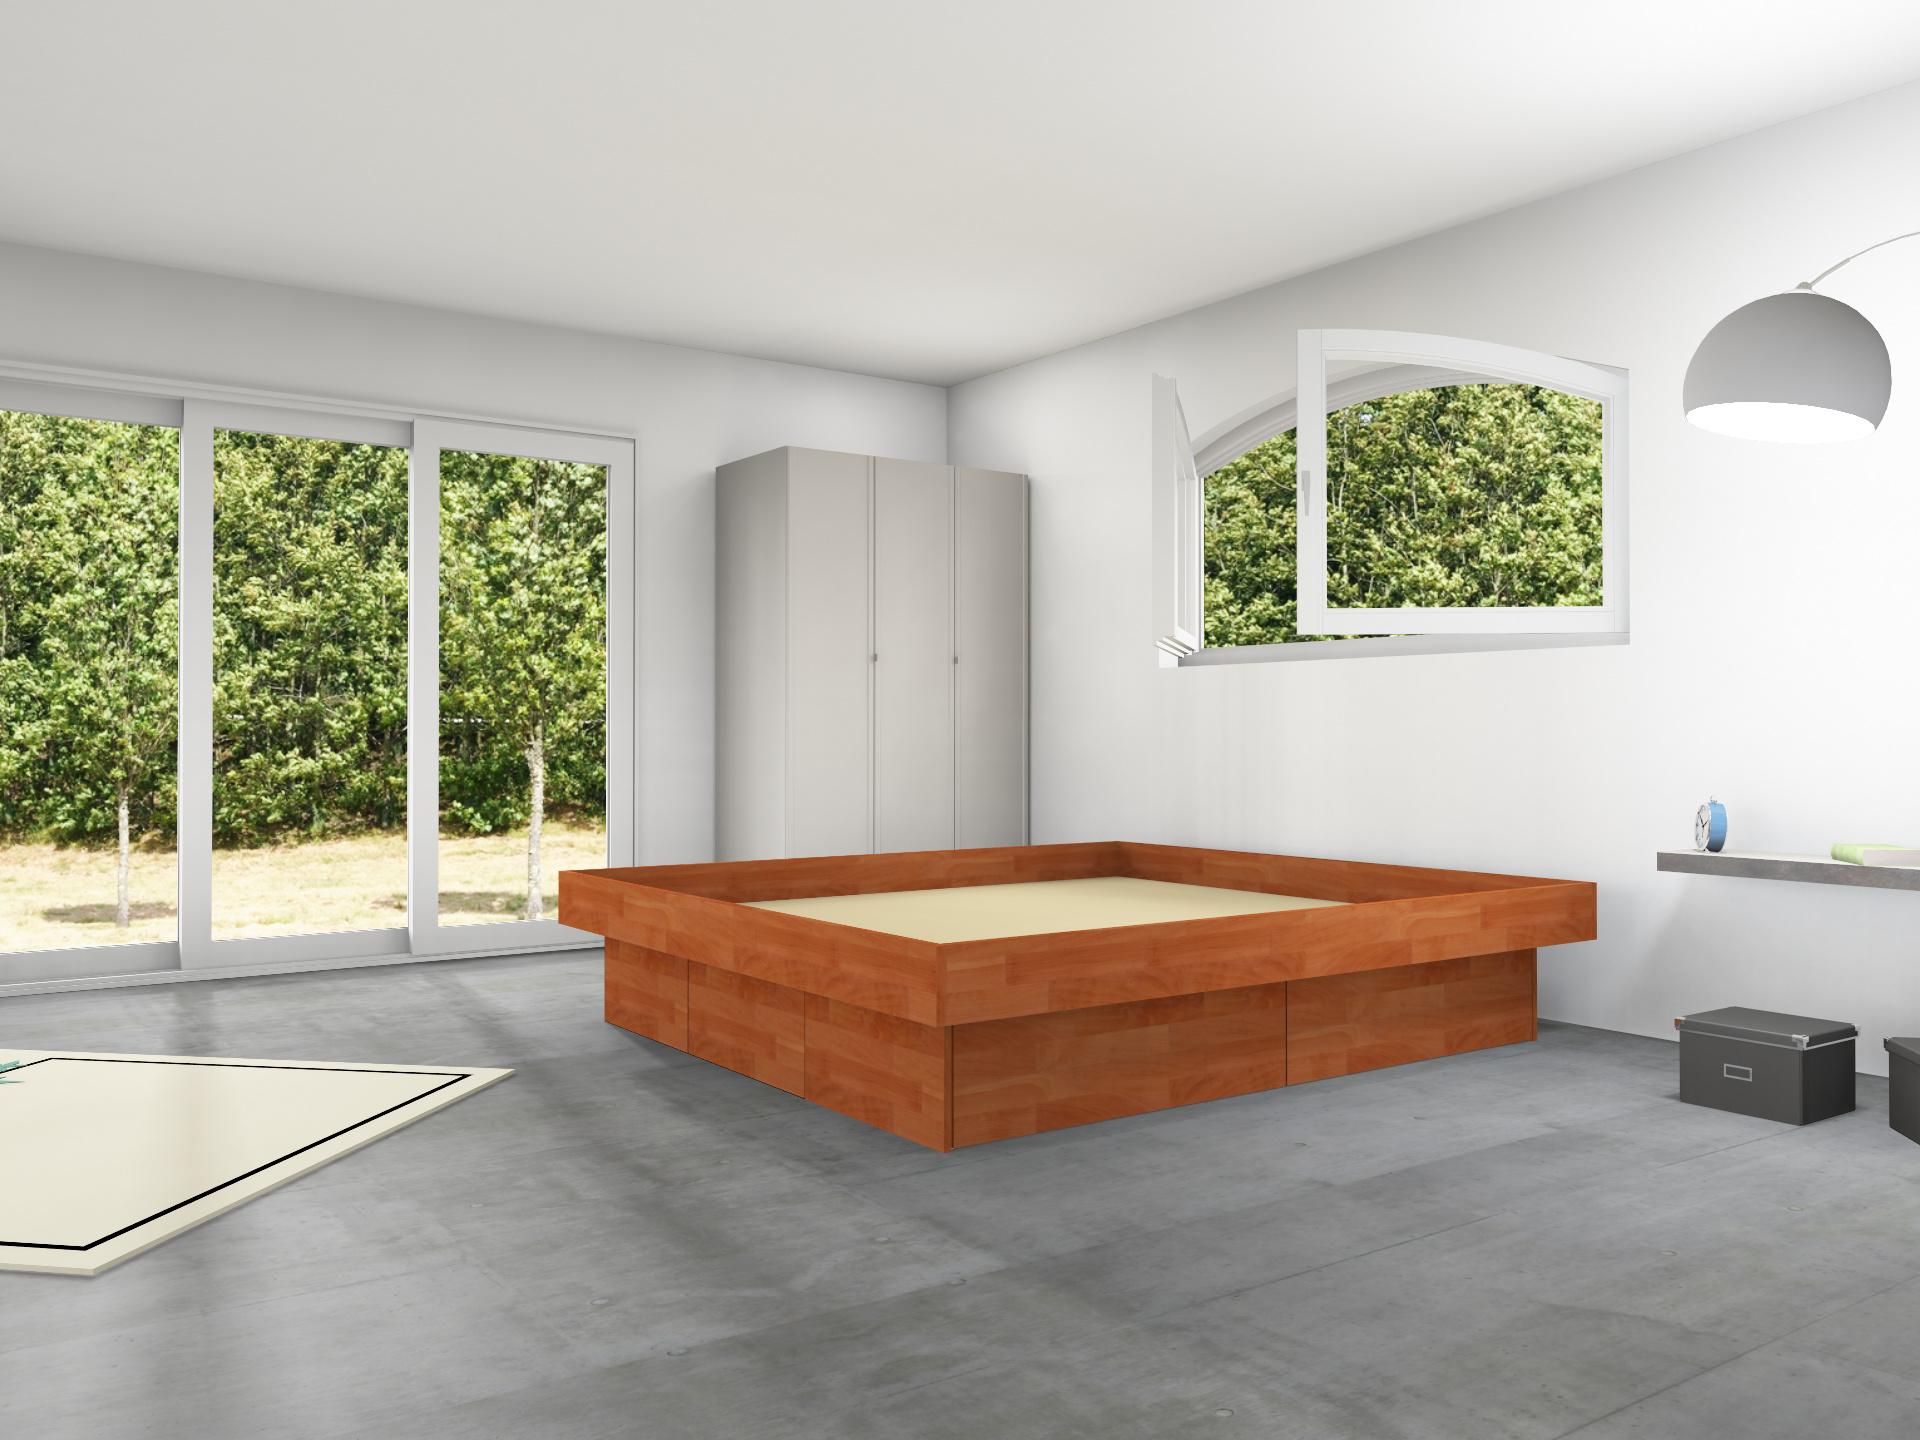 4er Schubladensockel Massivholz Podest für Wasserbetten inkl. Umrandung, Tiptronic